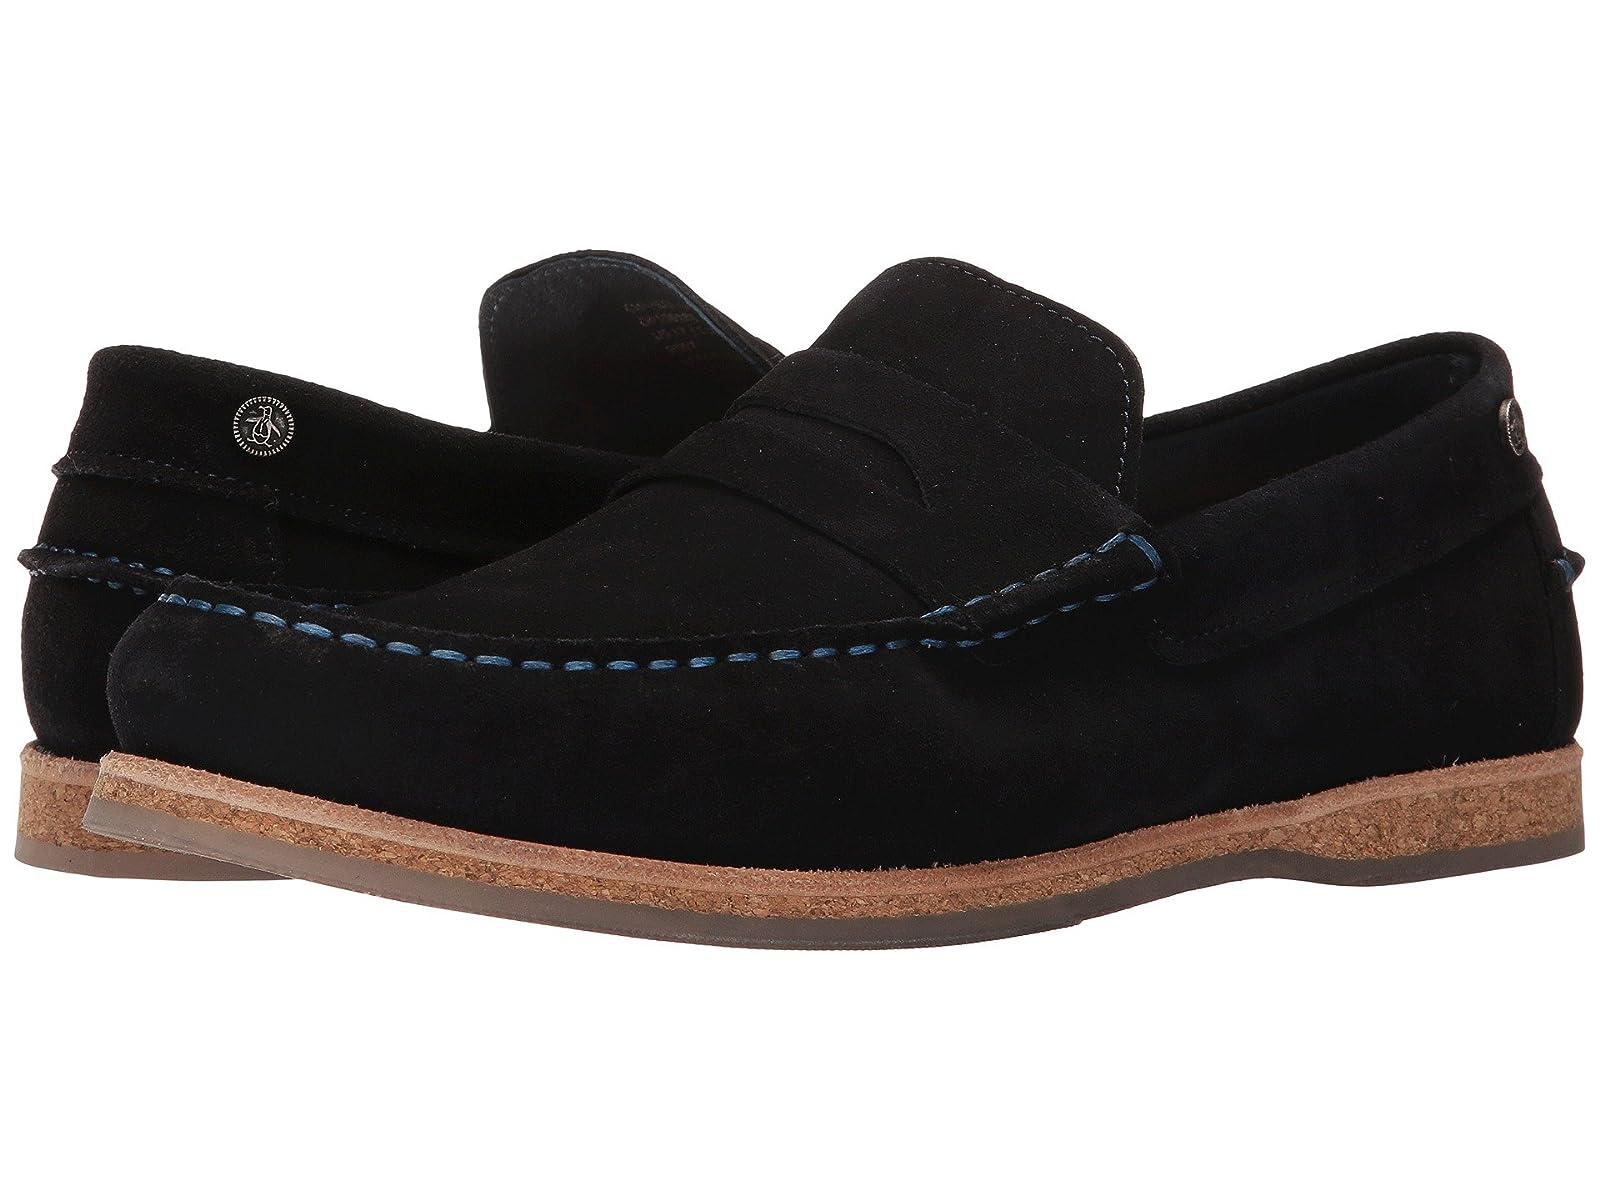 Original Penguin CharlesCheap and distinctive eye-catching shoes